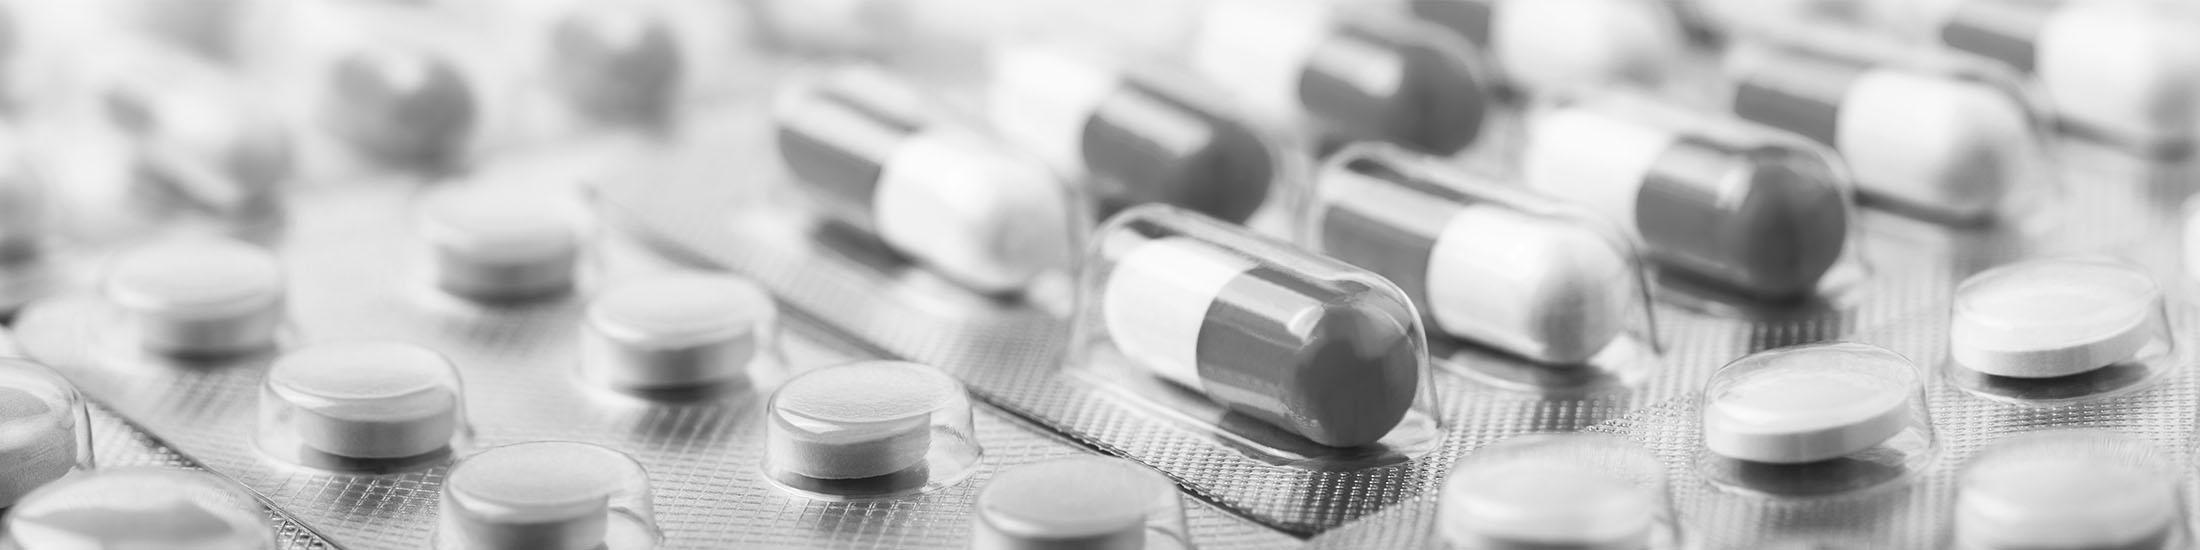 Rotolok Homepage Pharmaceutical Slide